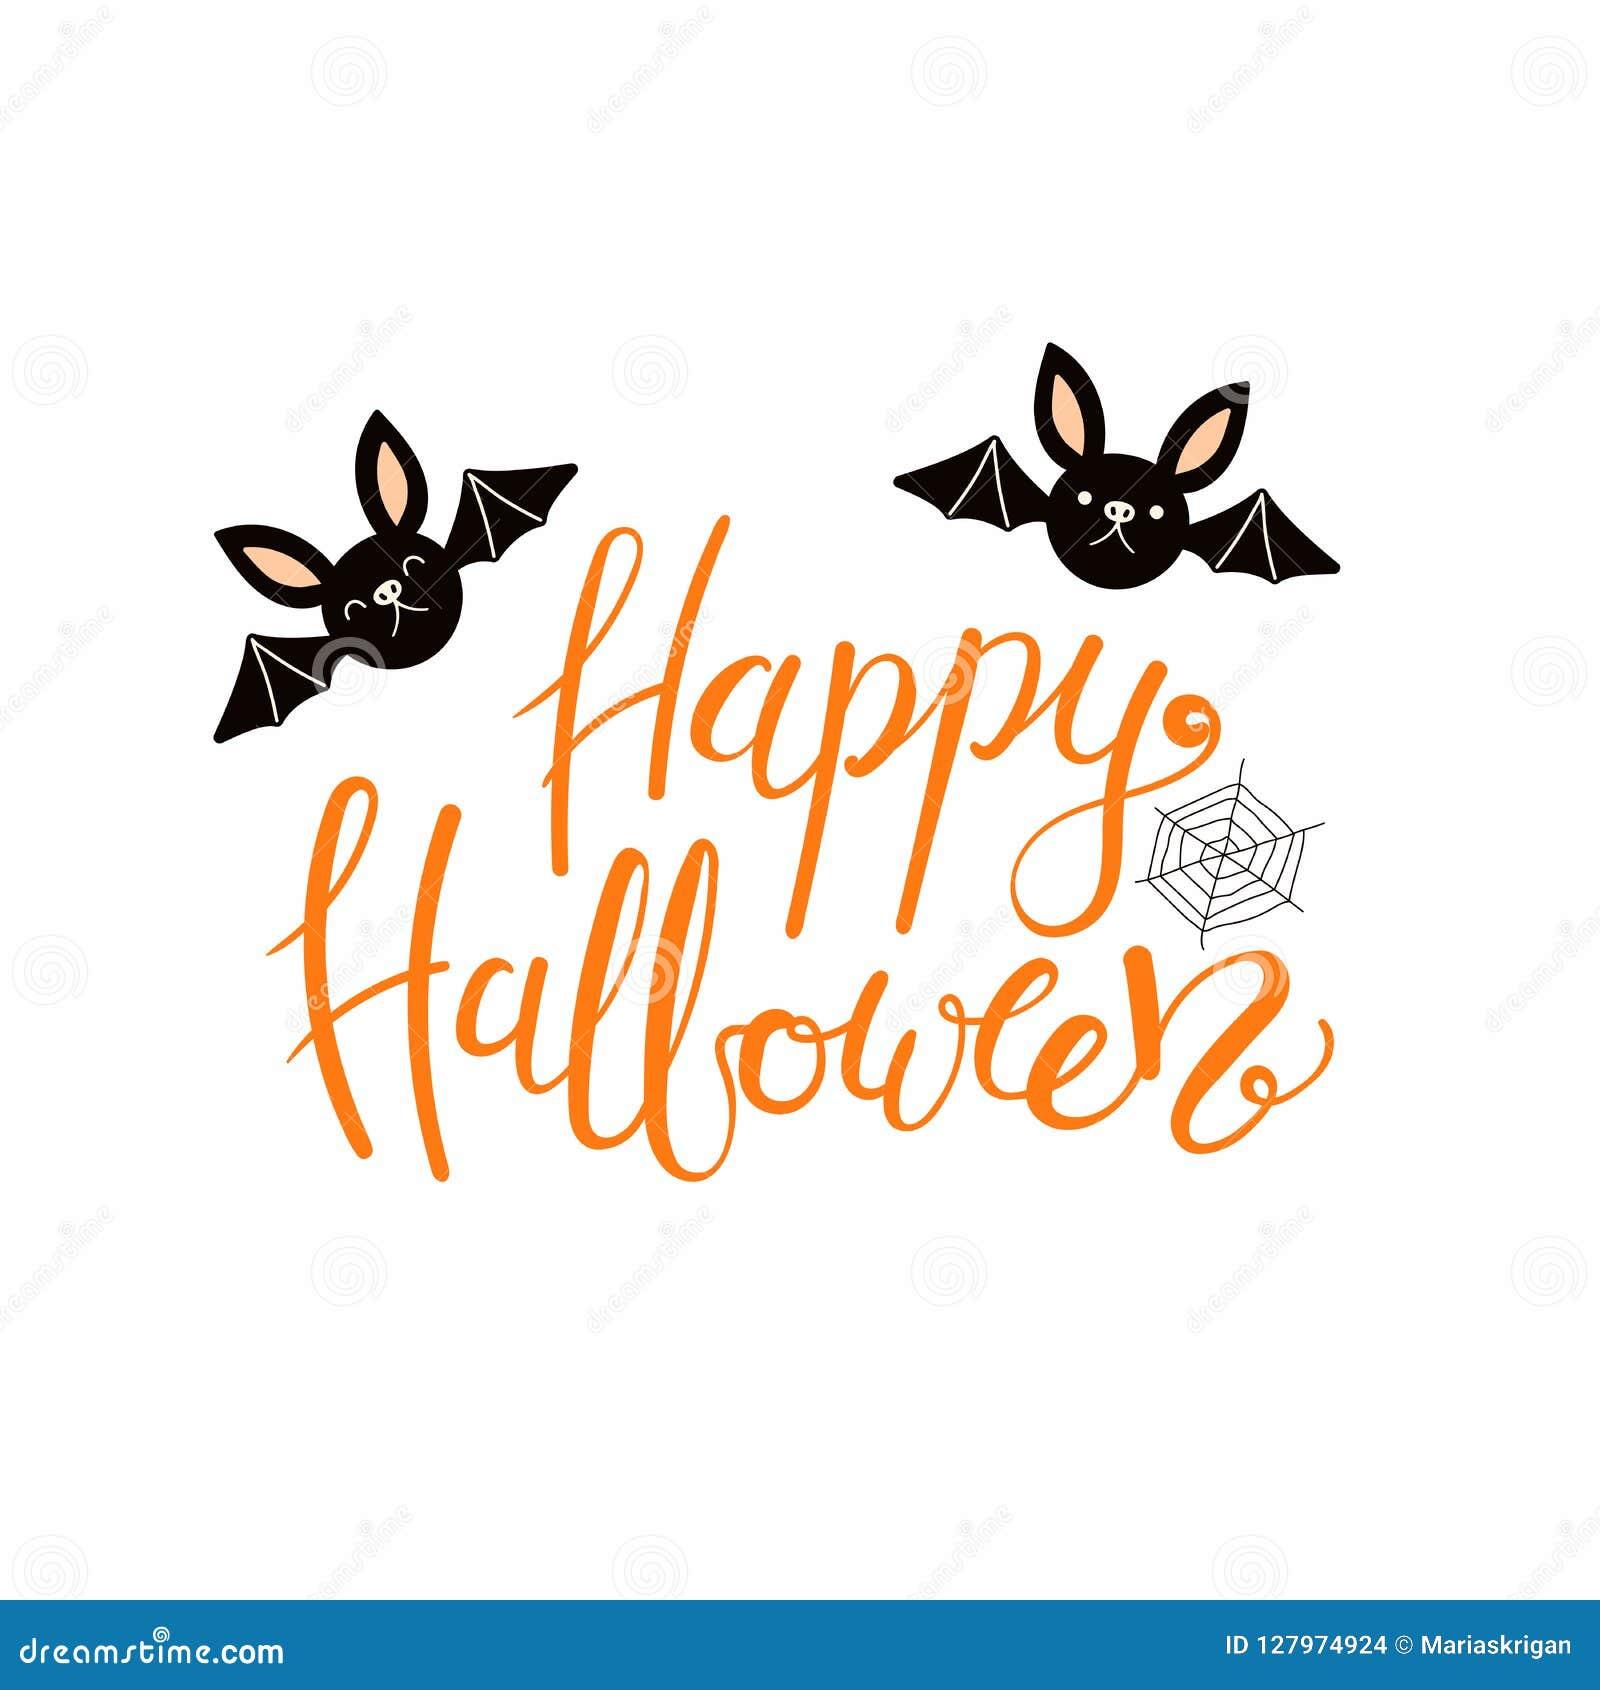 Happy Halloween Lettering Quote Stock Vector Illustration Of Girl Design 127974924